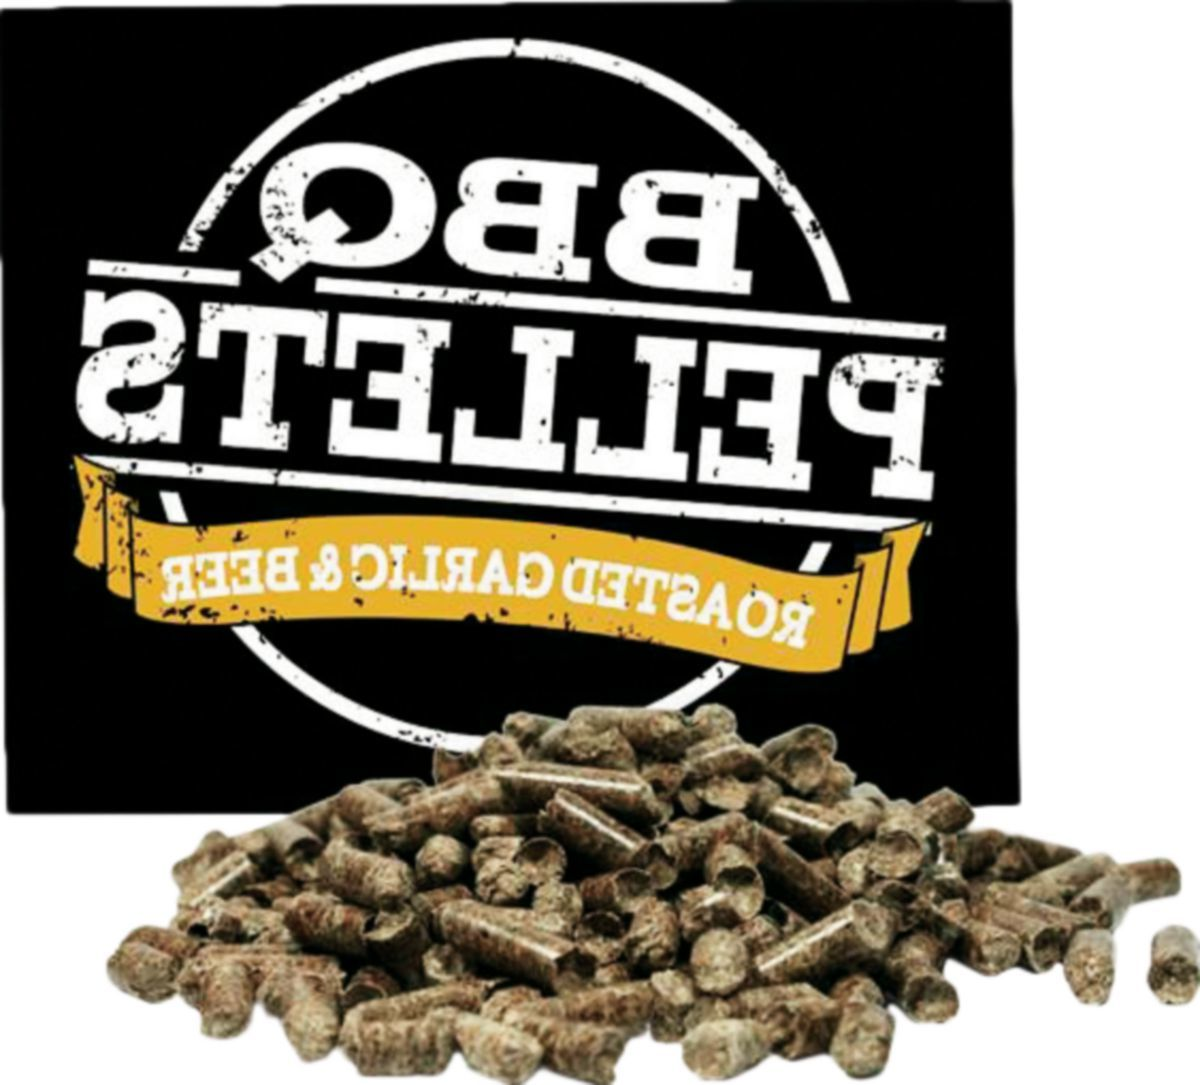 Cabela's Roasted Garlic & Beer Wood Pellets